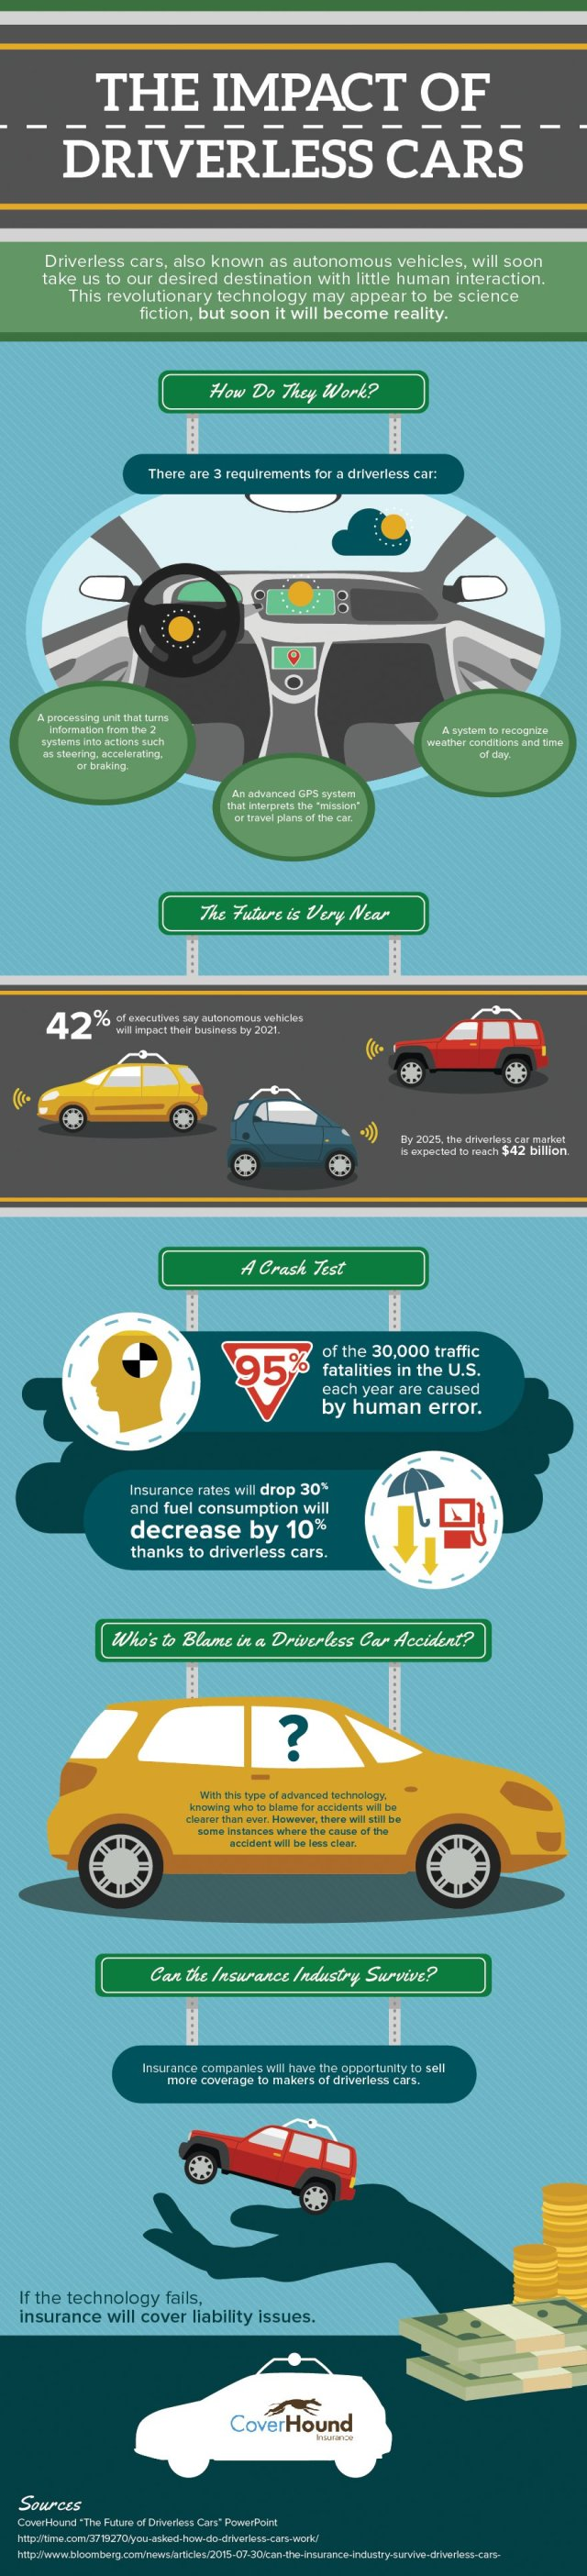 the-impact-of-driverless-cars_568a3dd474b25